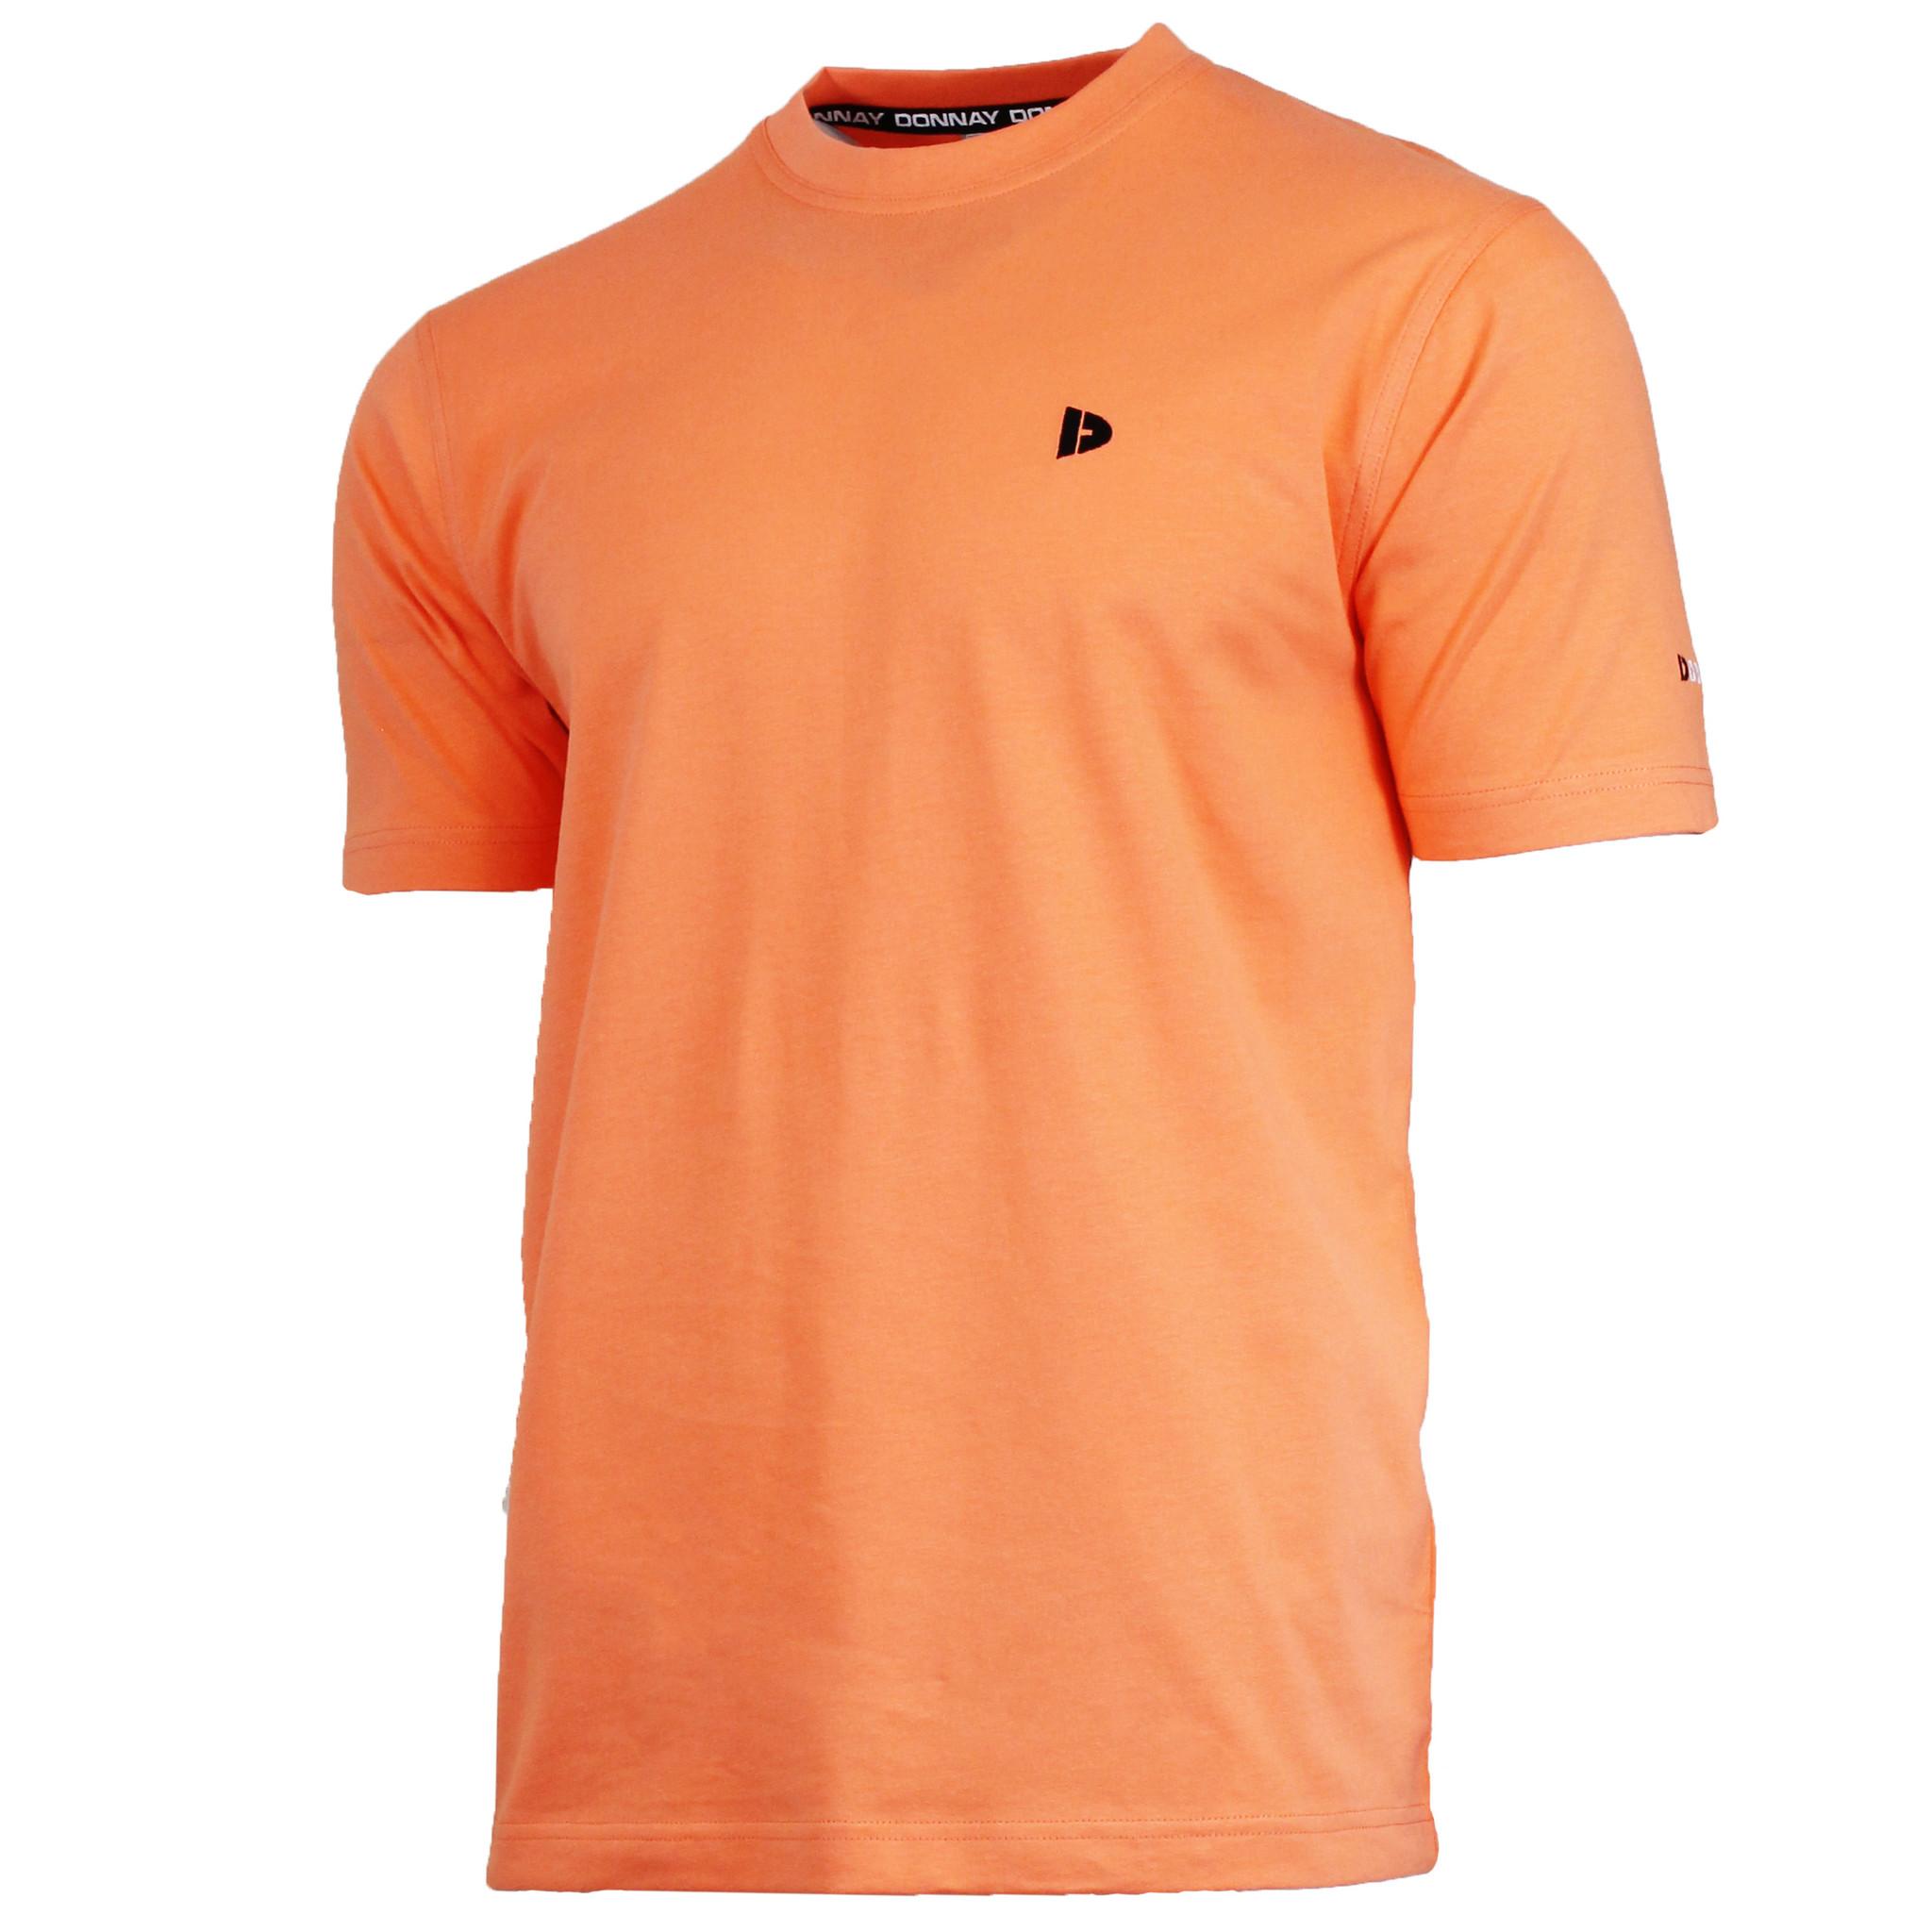 Donnay Donnay Heren - T-Shirt Vince - Meloen Oranje